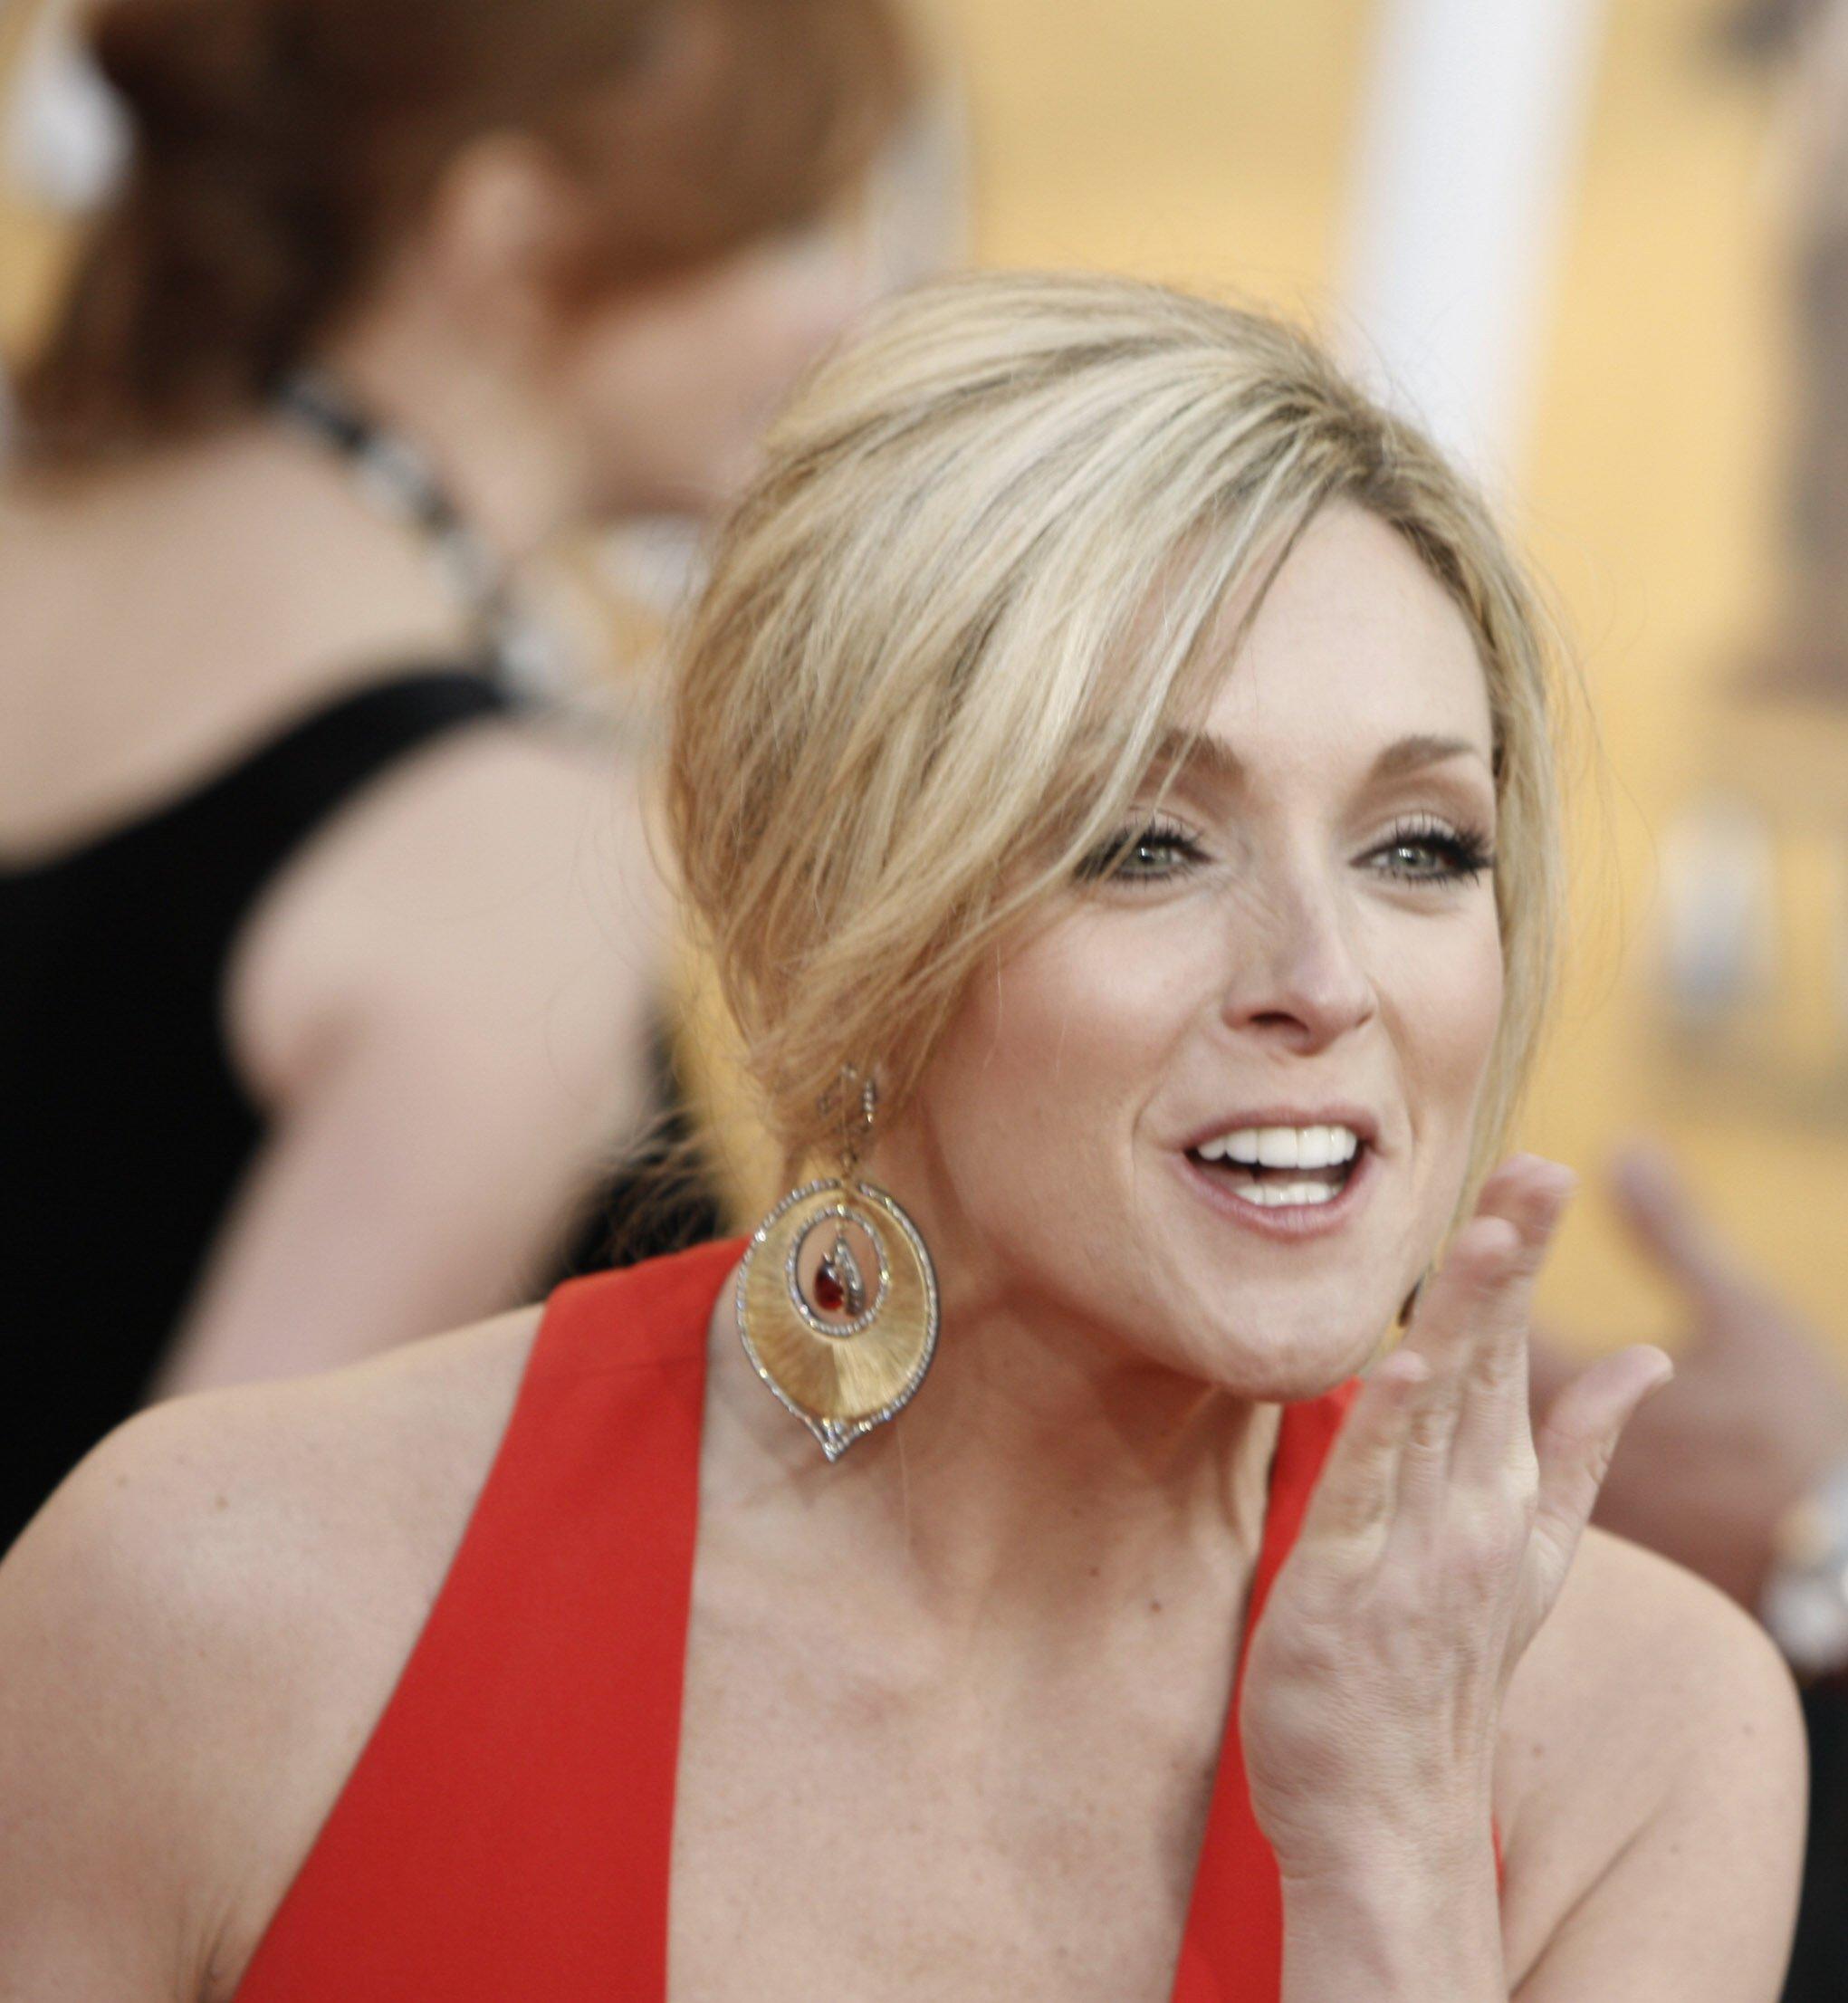 32981_Celebutopia-Jane_Krakowski_arrives_at_the_15th_Annual_Screen_Actors_Guild_Awards-04_122_978lo.jpg